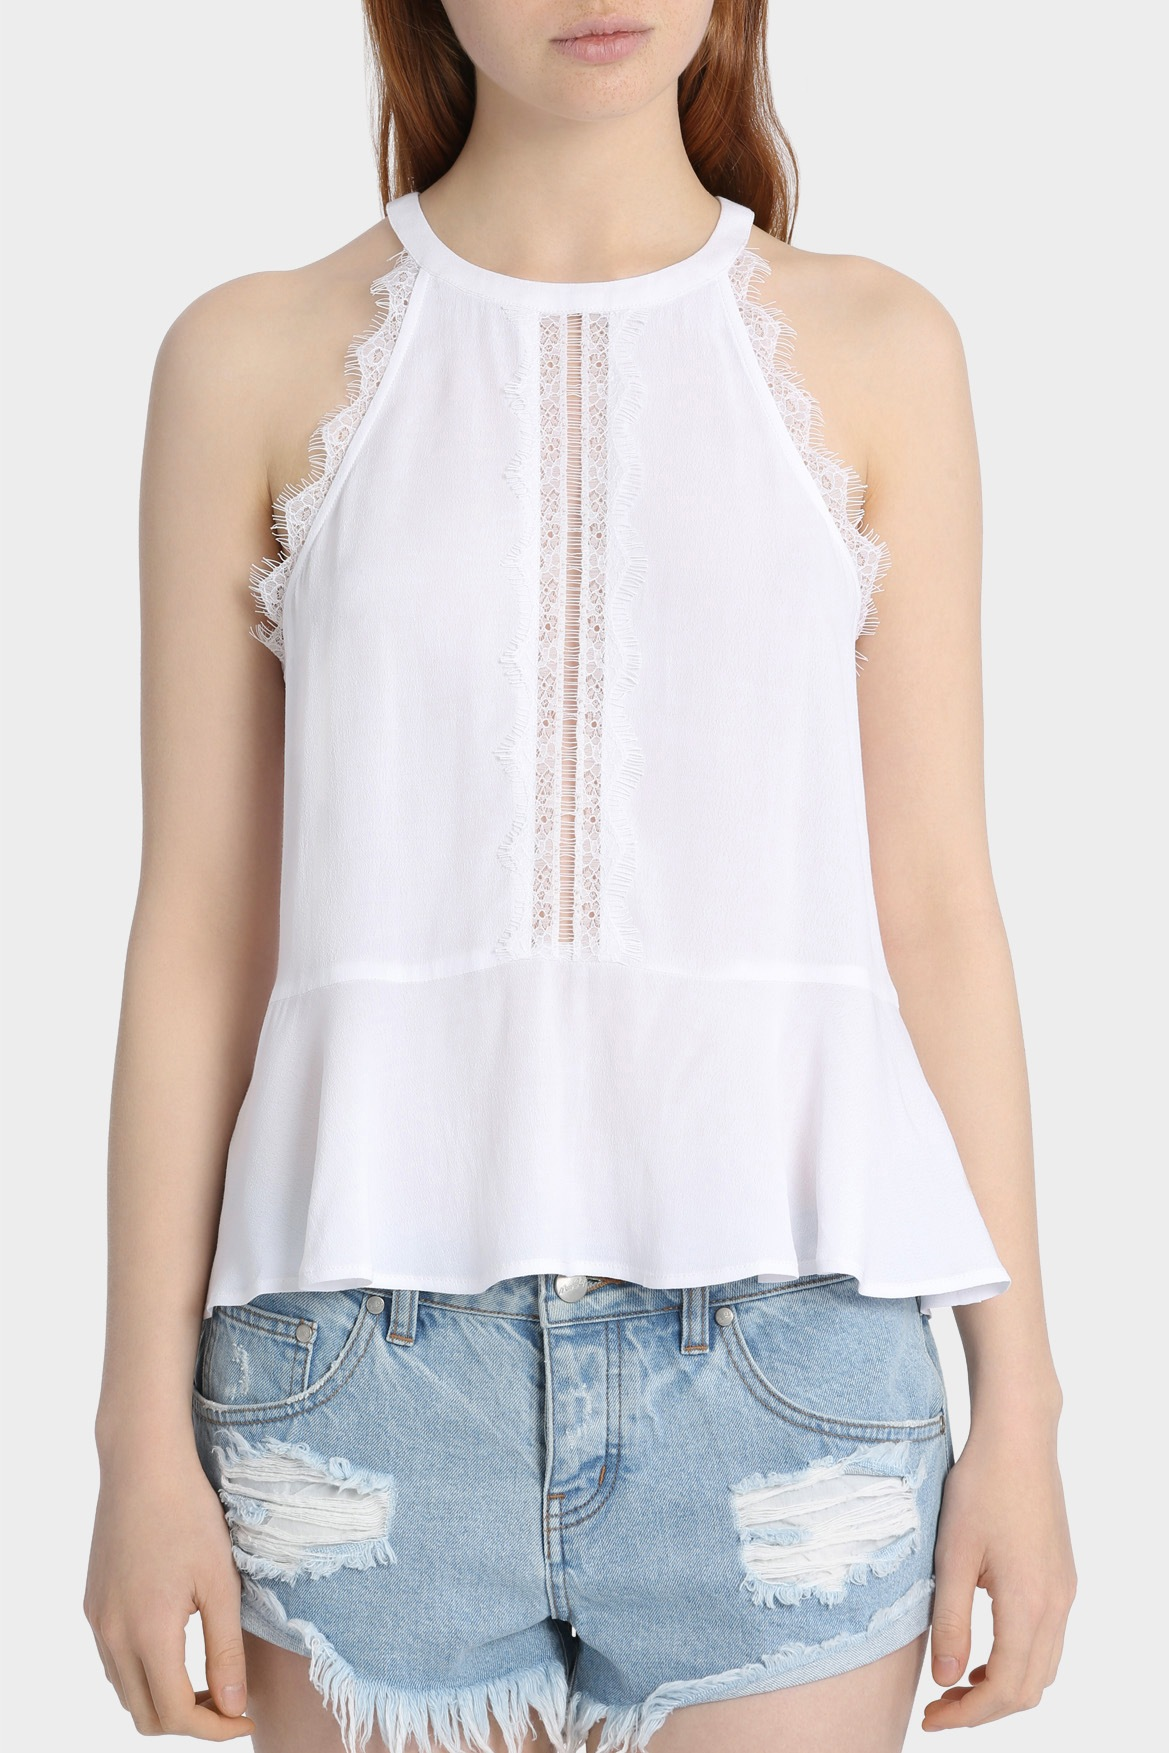 White apron lace trim - White Apron Lace Trim 39